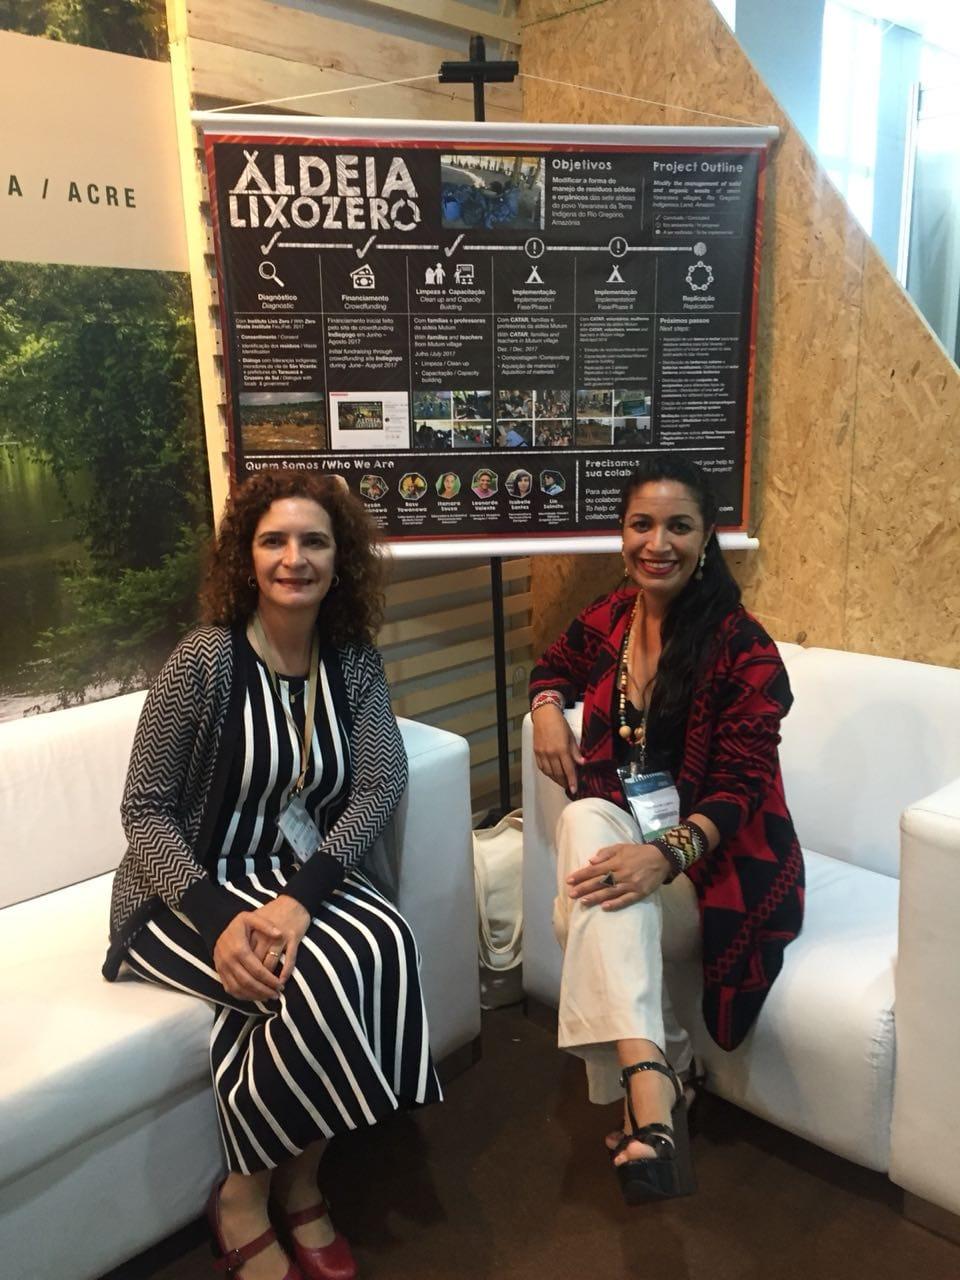 Aldeia Lixo Zero representative - Itamara Souza - and the State of Acre first lady - Marlucia Candida.       Brasília - June 2018.